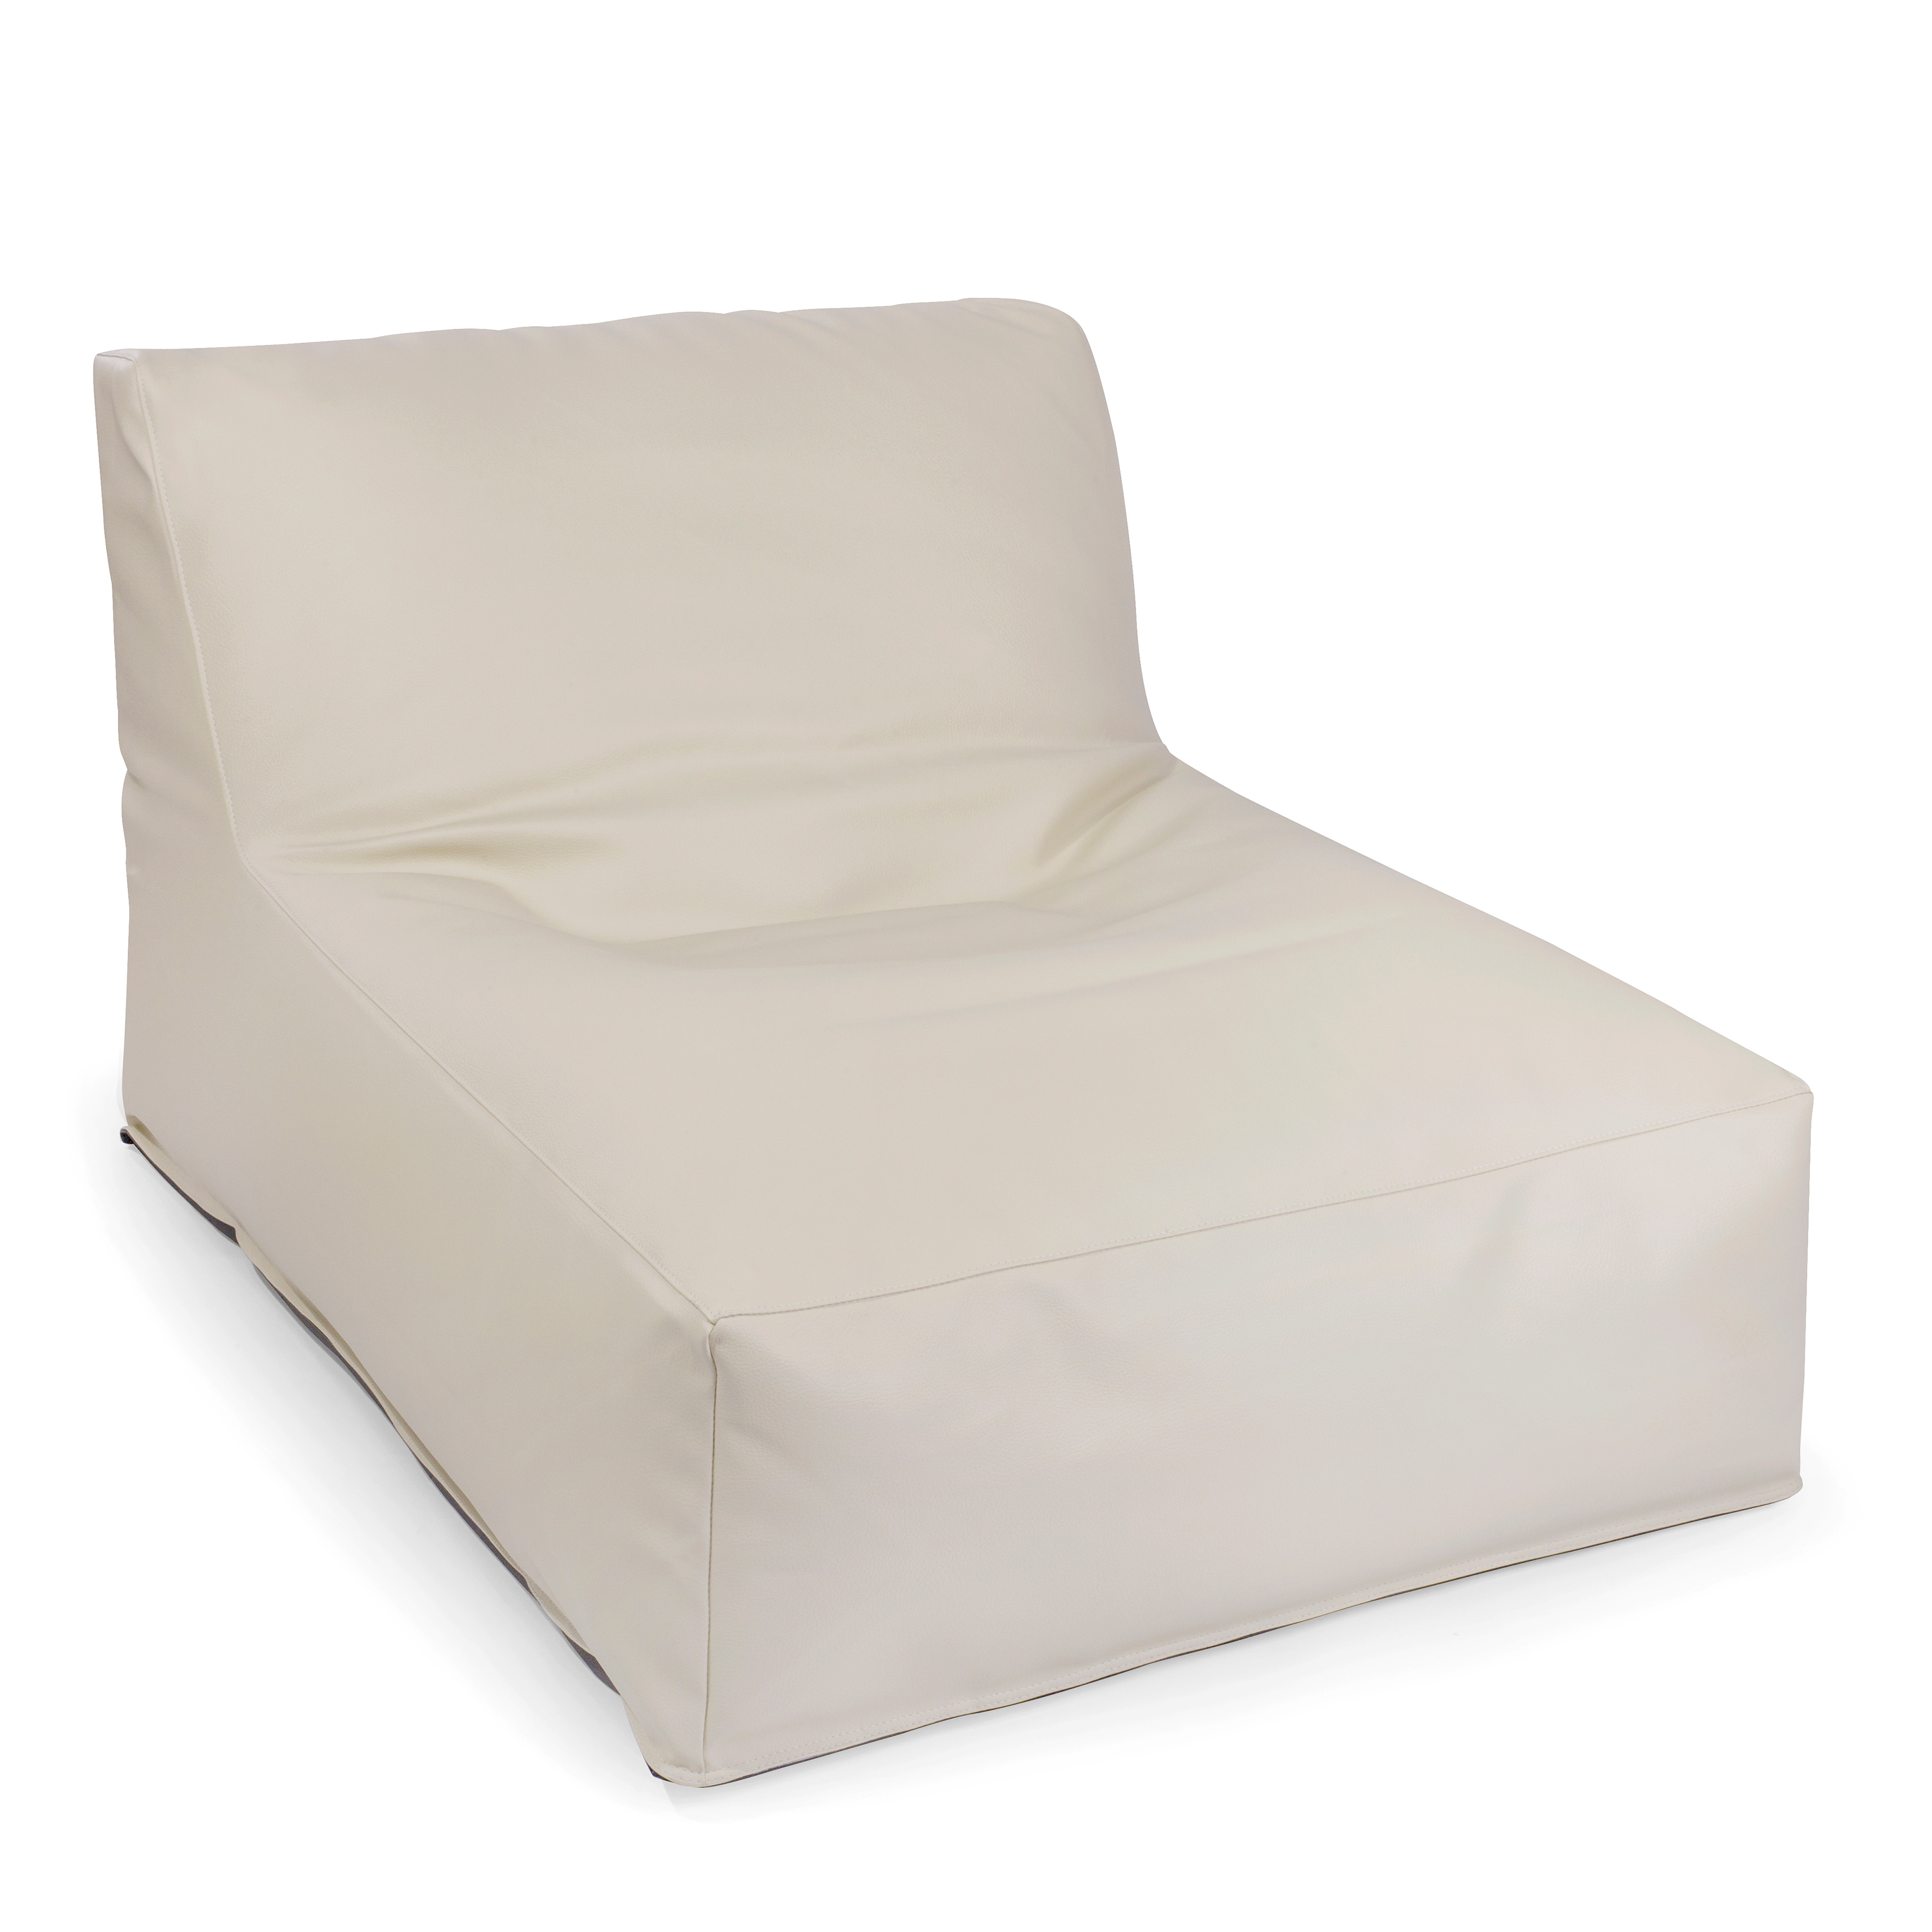 outbag outdoor sitzsack newlounge 120 x 90 cm wetterfest gartenm bel lounge. Black Bedroom Furniture Sets. Home Design Ideas